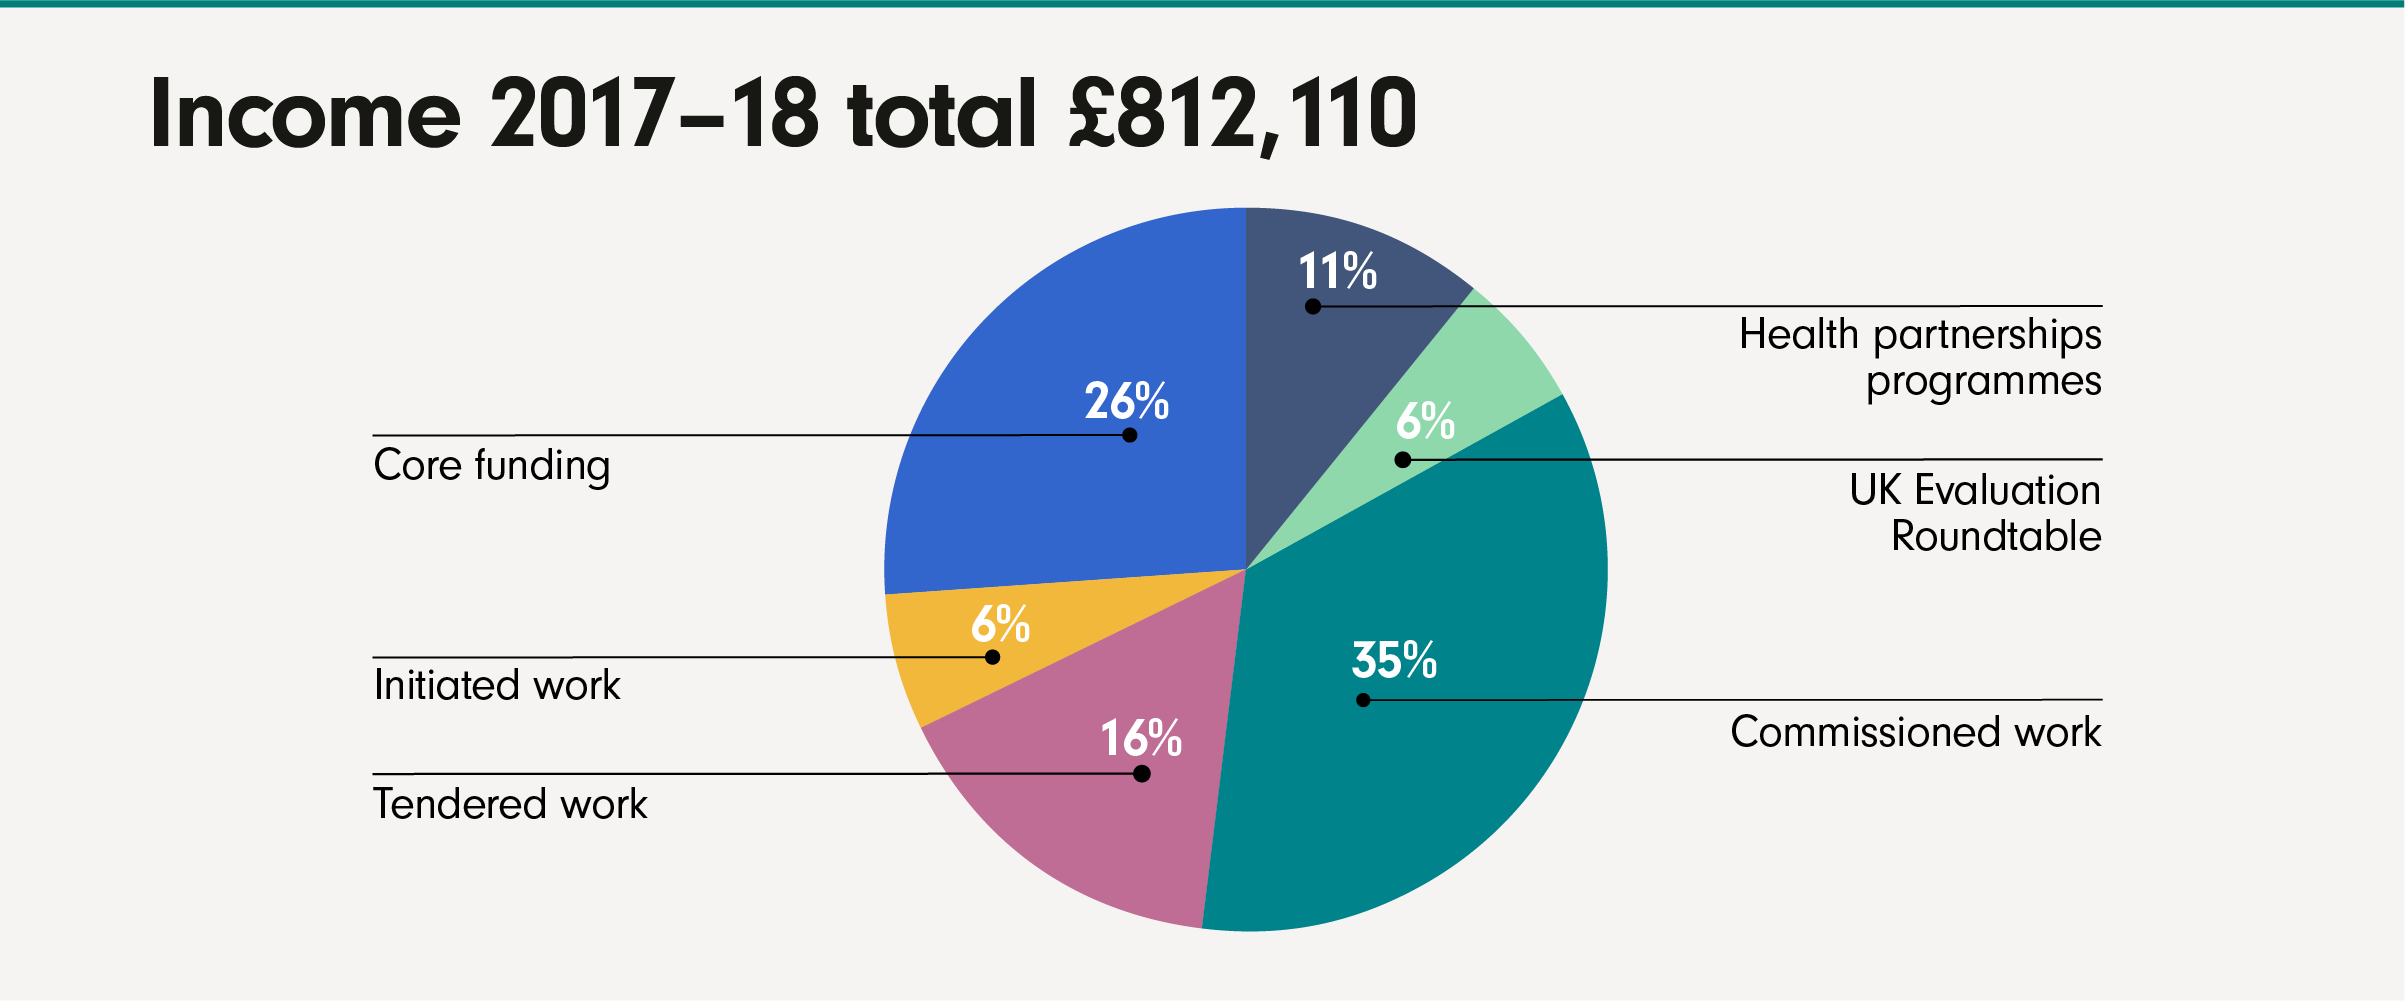 IVAR004—2017-18 Income chart